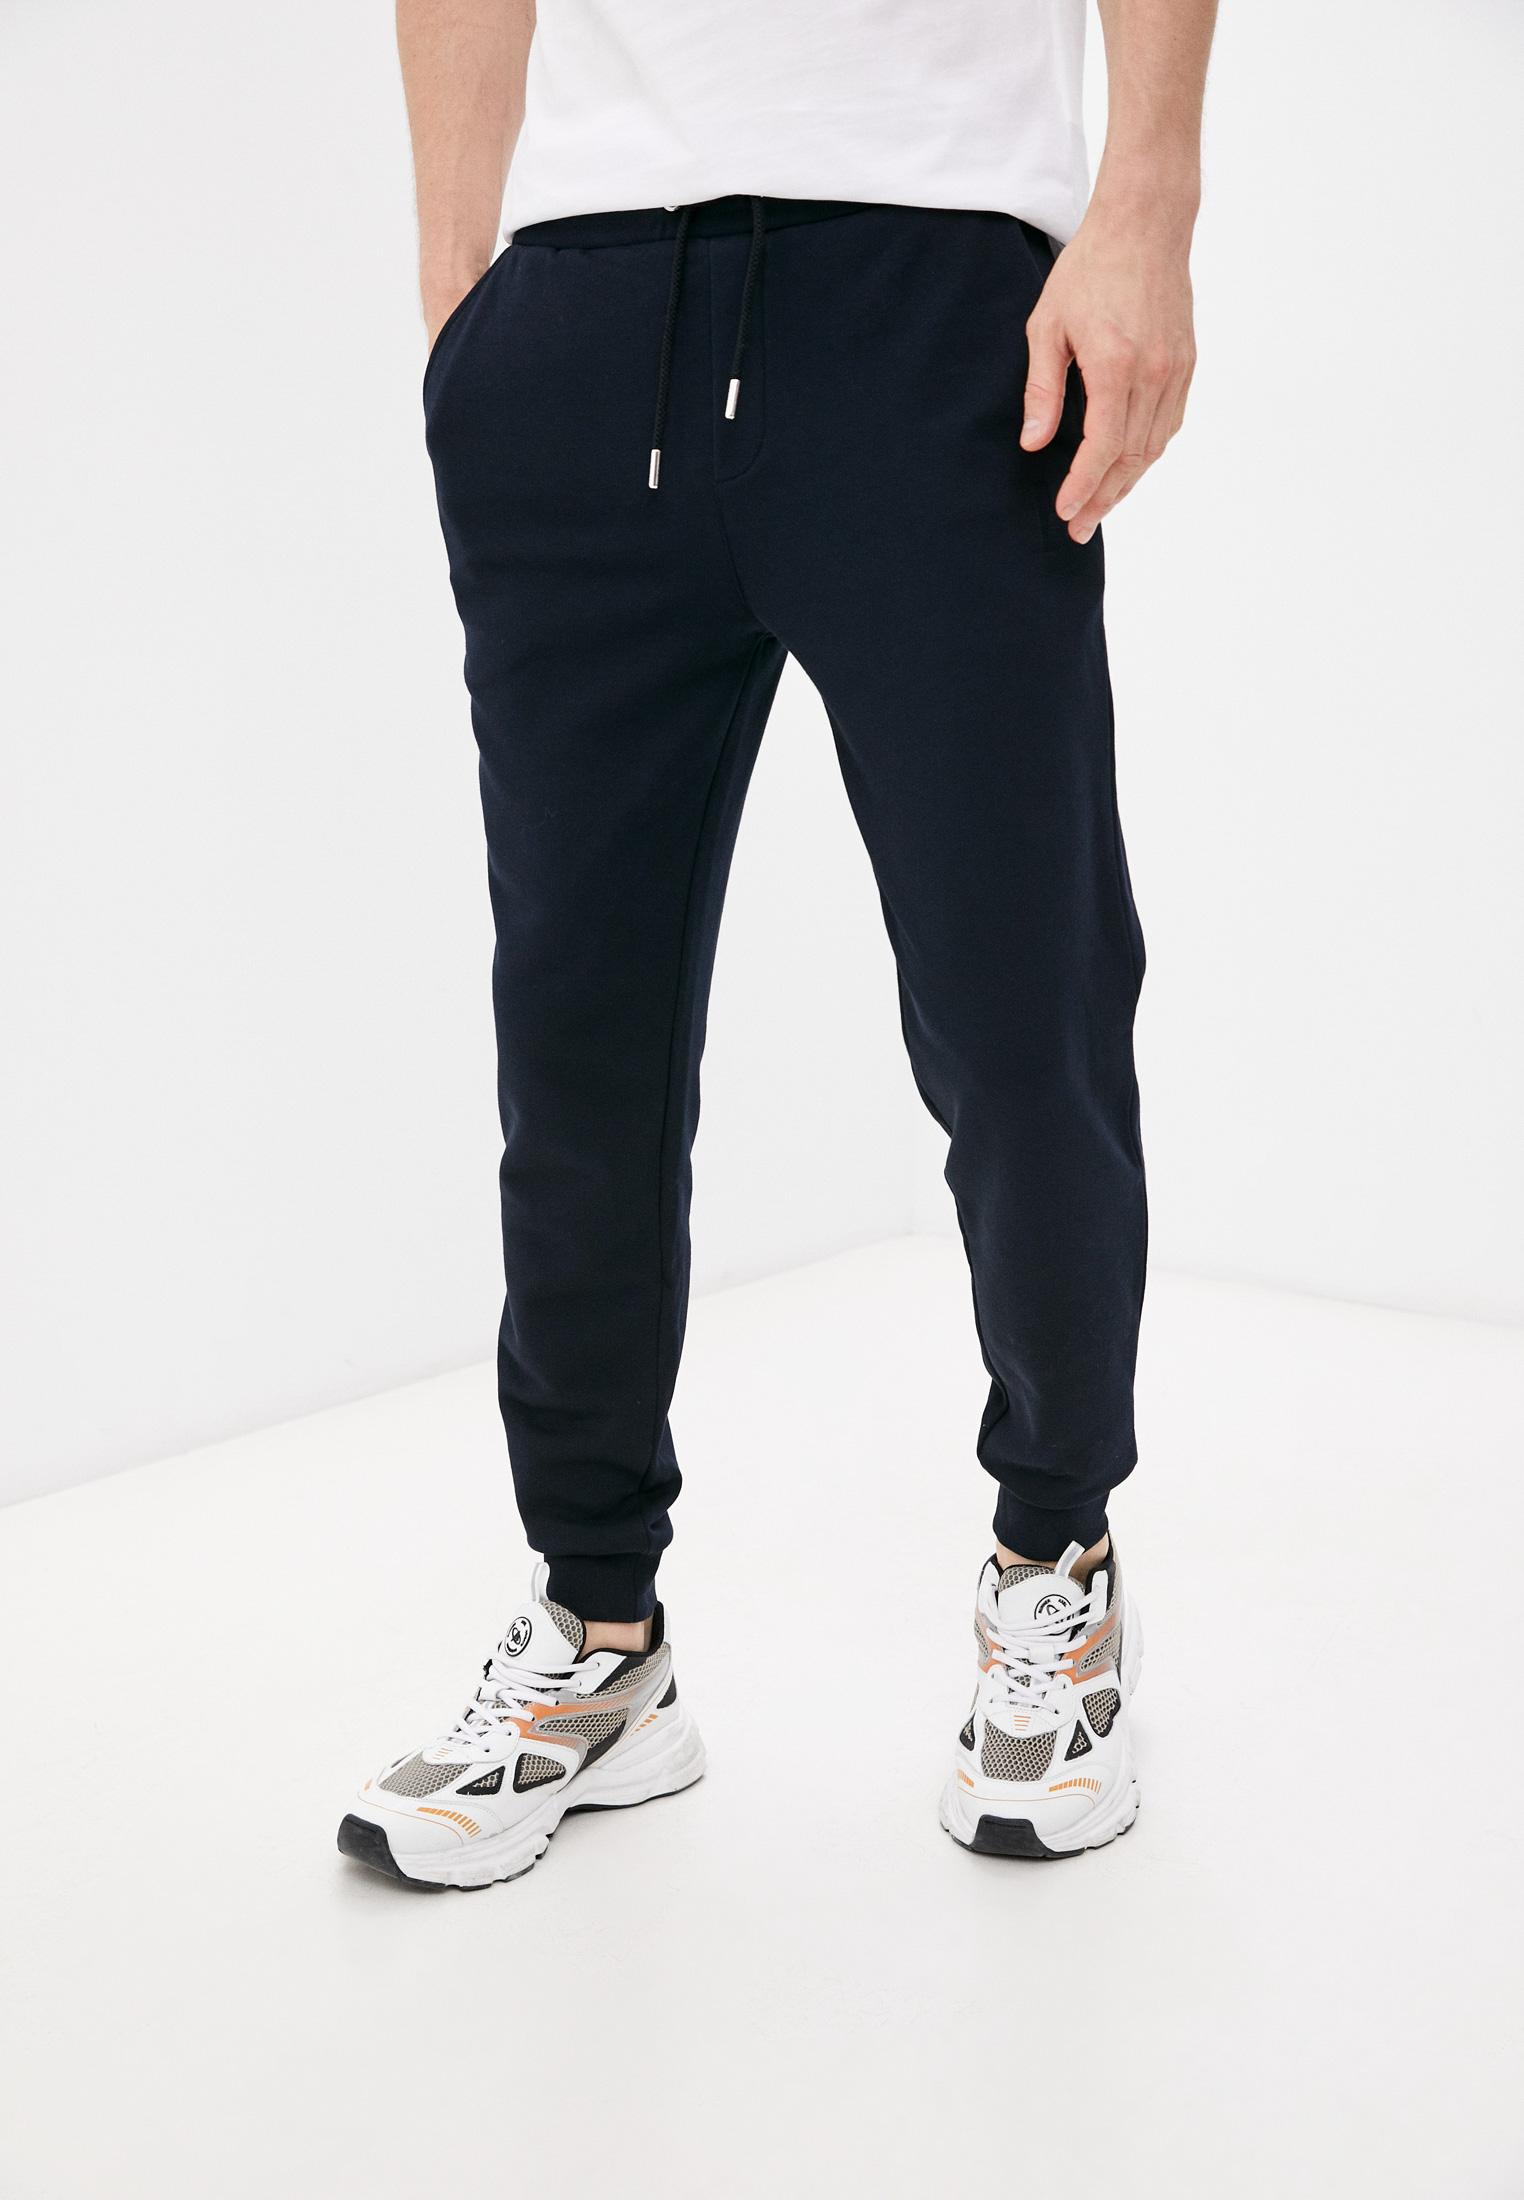 Мужские спортивные брюки Karl Lagerfeld (Карл Лагерфельд) 500900-705893